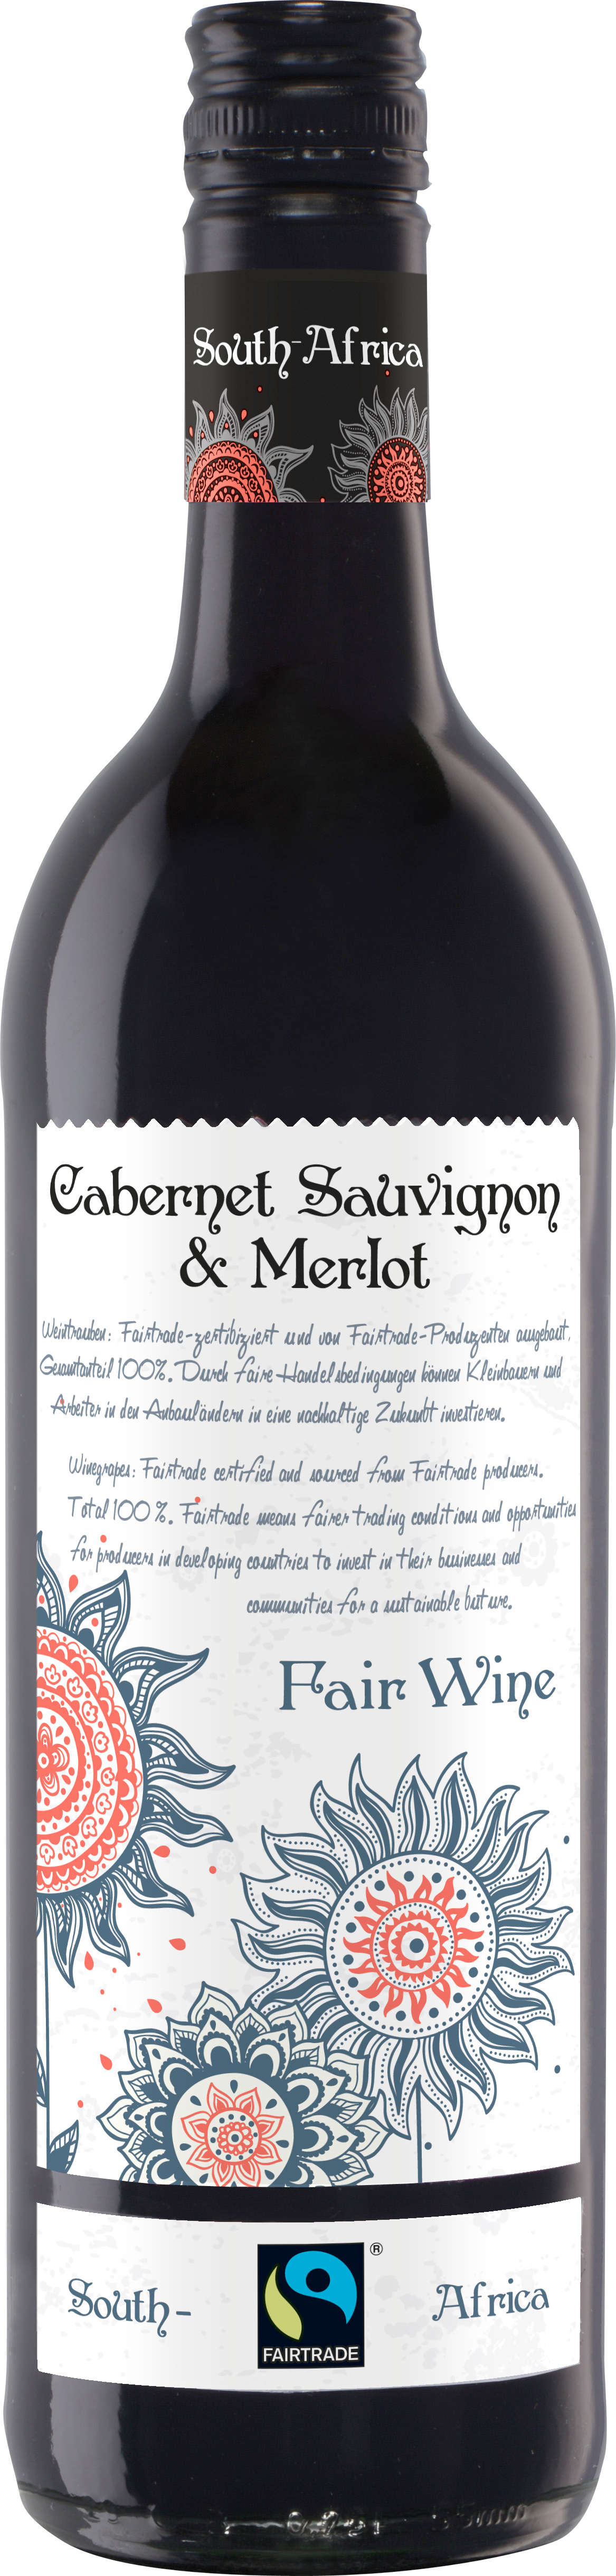 Cabernet Sauvignon & Merlot